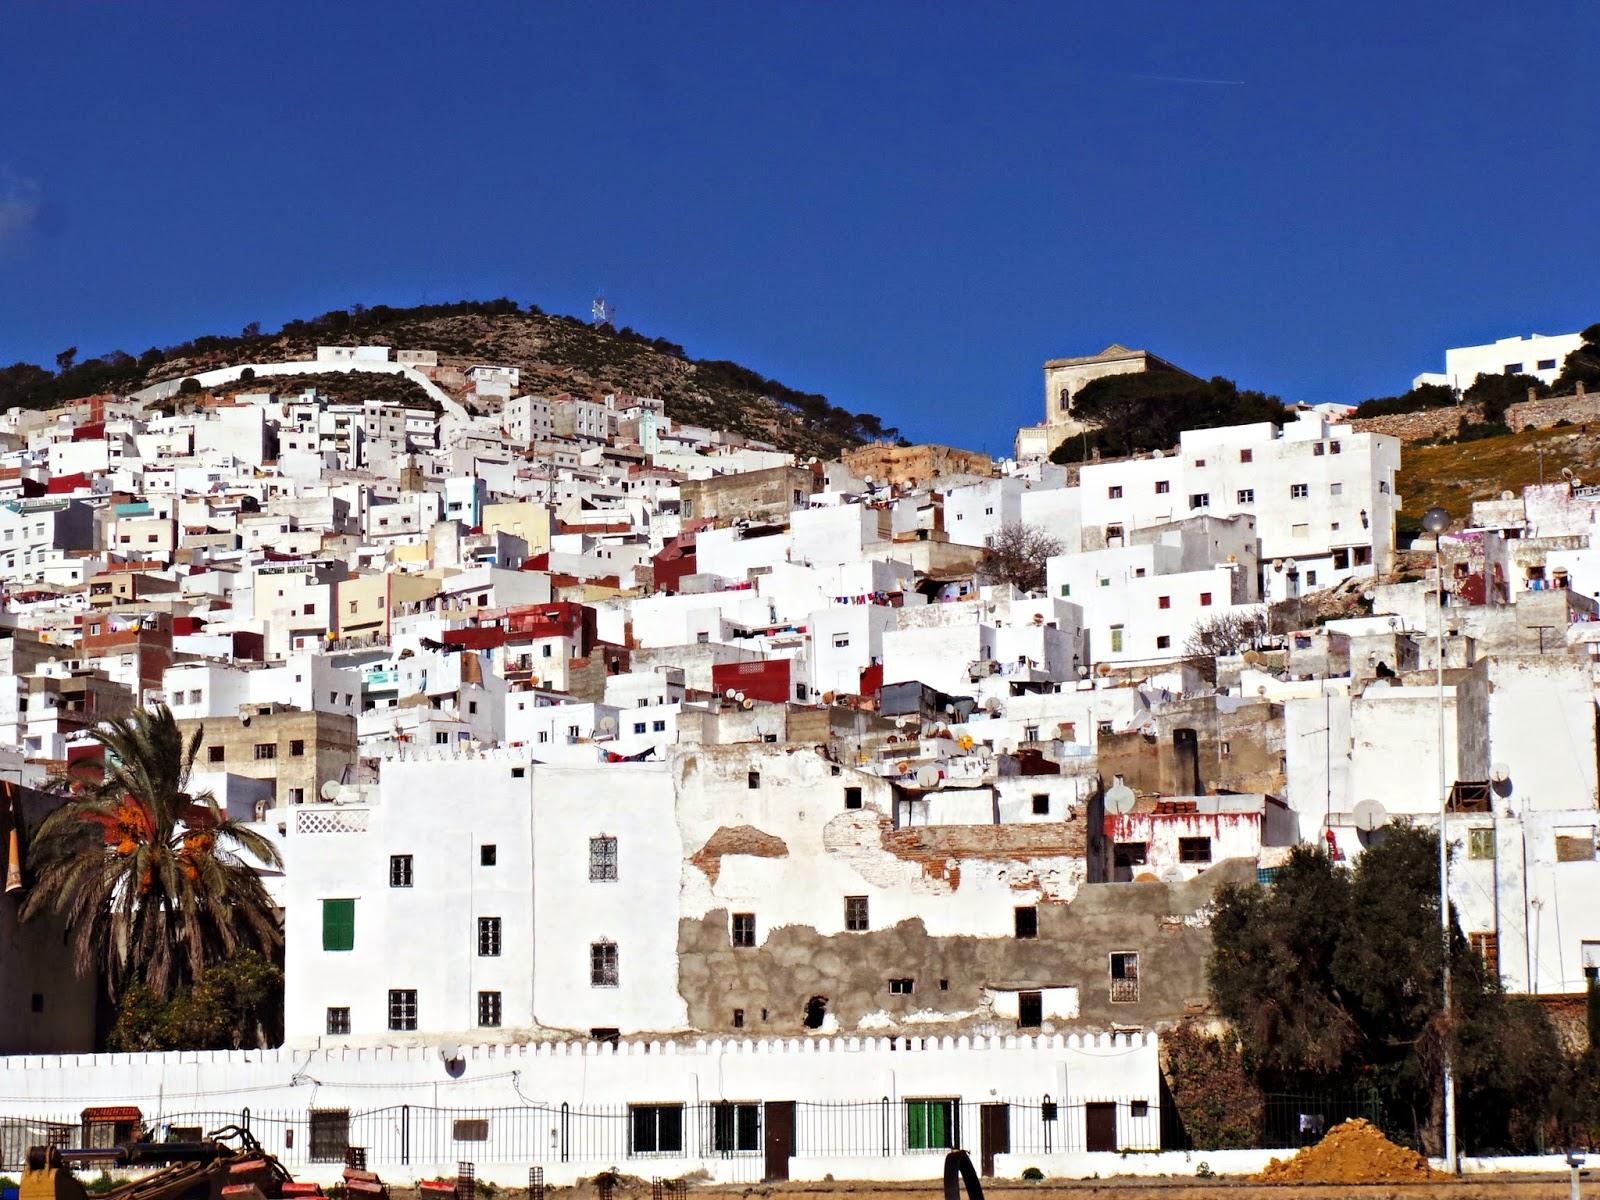 tetouan-vista-panoramica - Descubriendo Marruecos